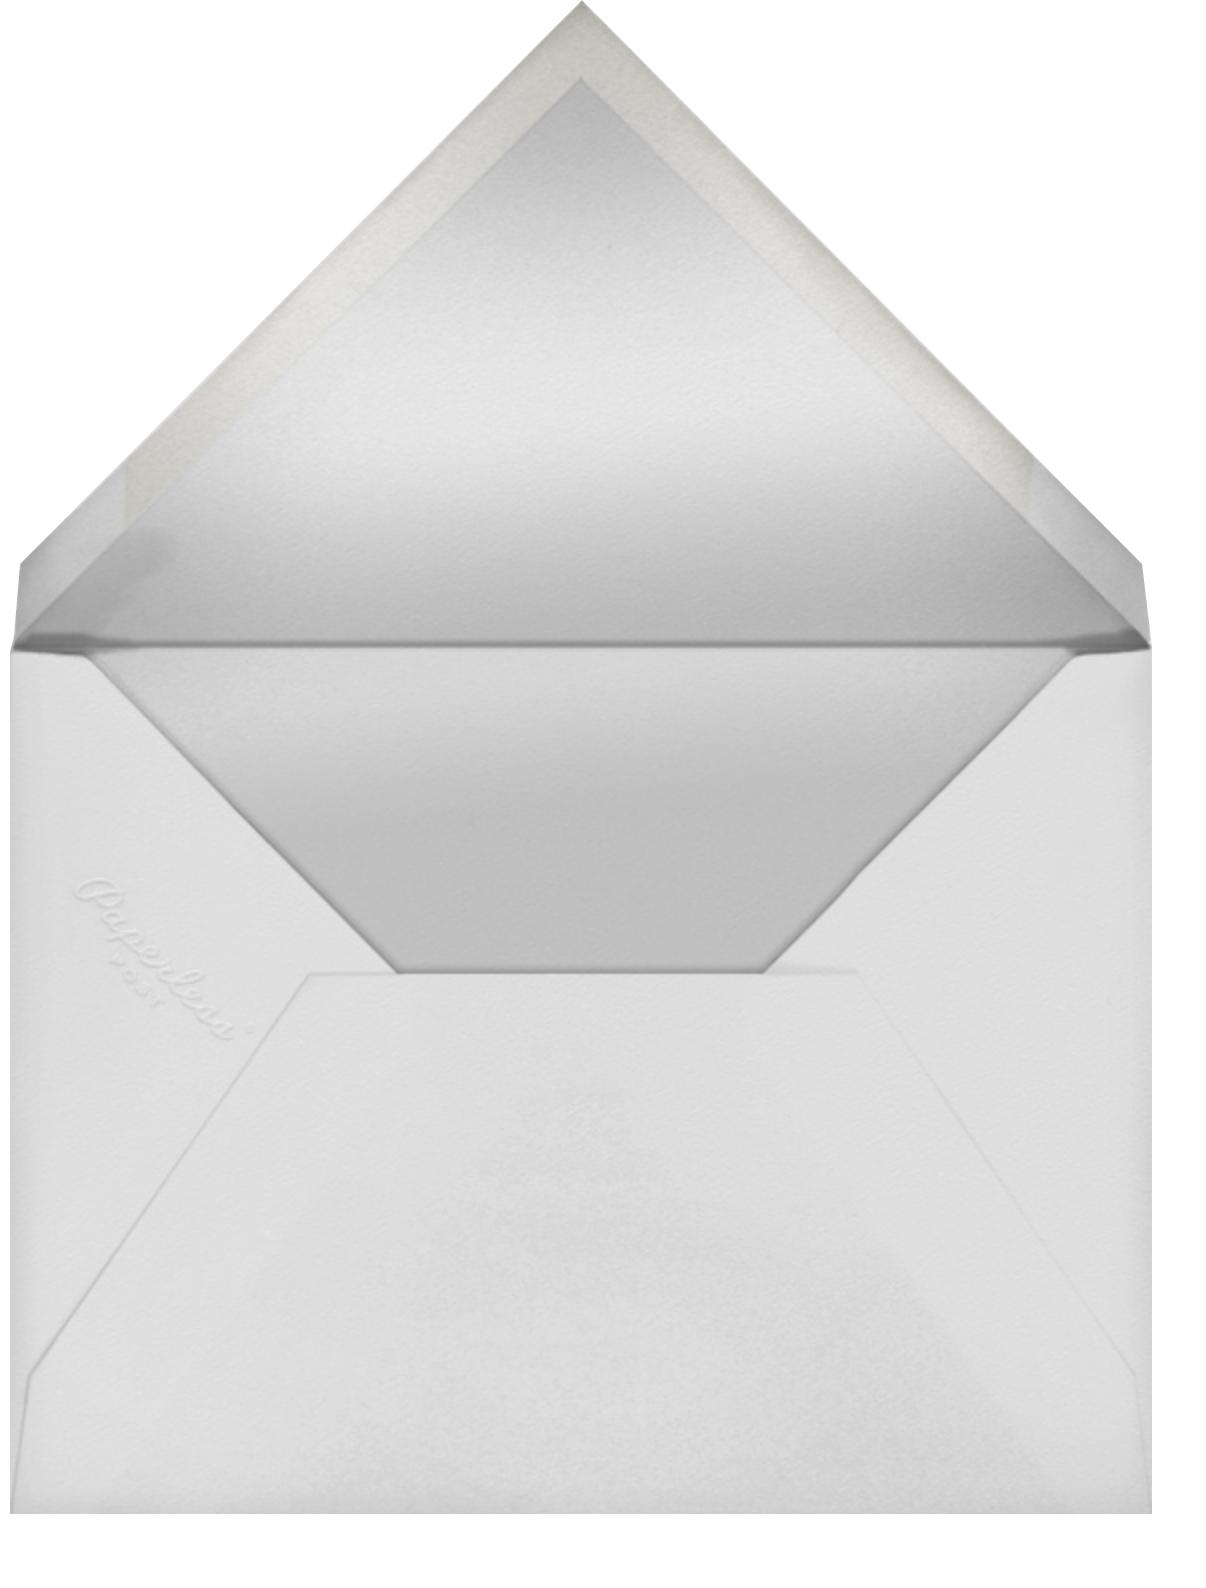 Heather and Lace (Menu) - Silver - Rifle Paper Co. - Menus - envelope back